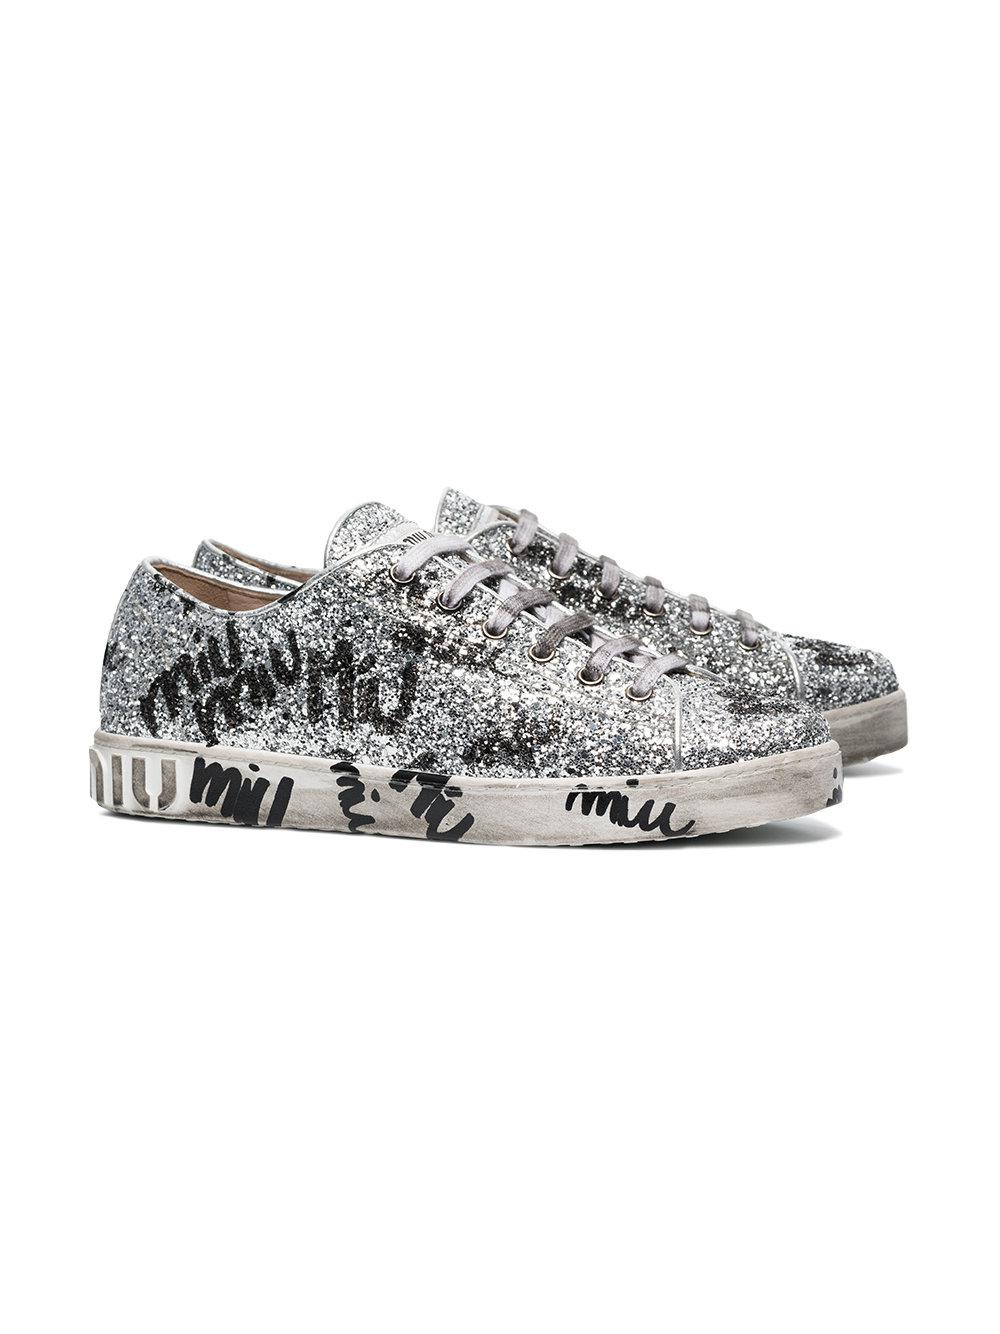 Miu Miu Silver Logo Graffiti Glitter Leather Sneakers in Metallic